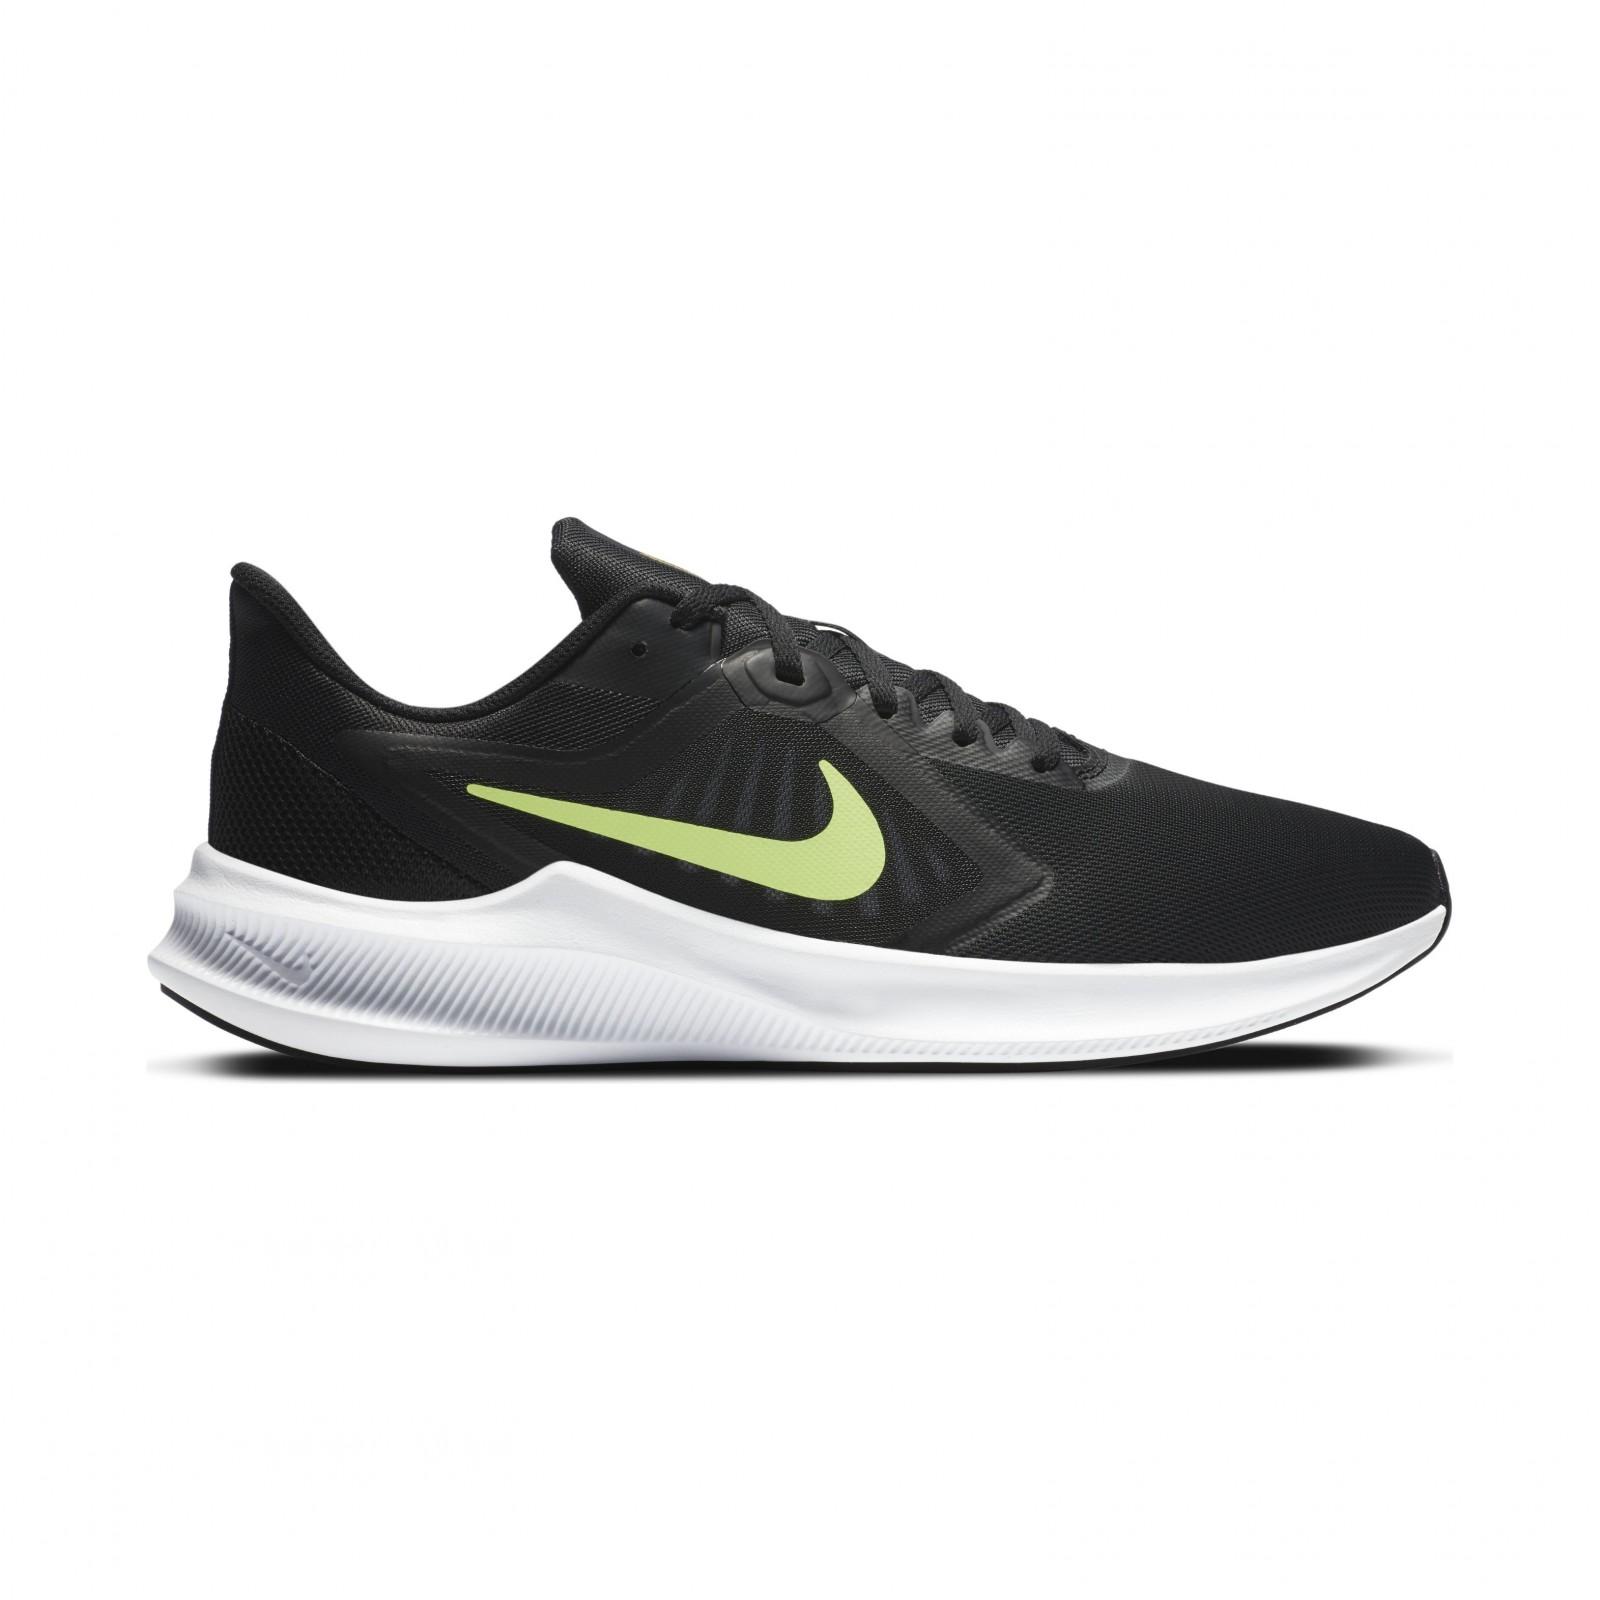 Nike downshifter 10 BLACK/VOLT GLOW-UNIVERSITY GOLD-WHITE